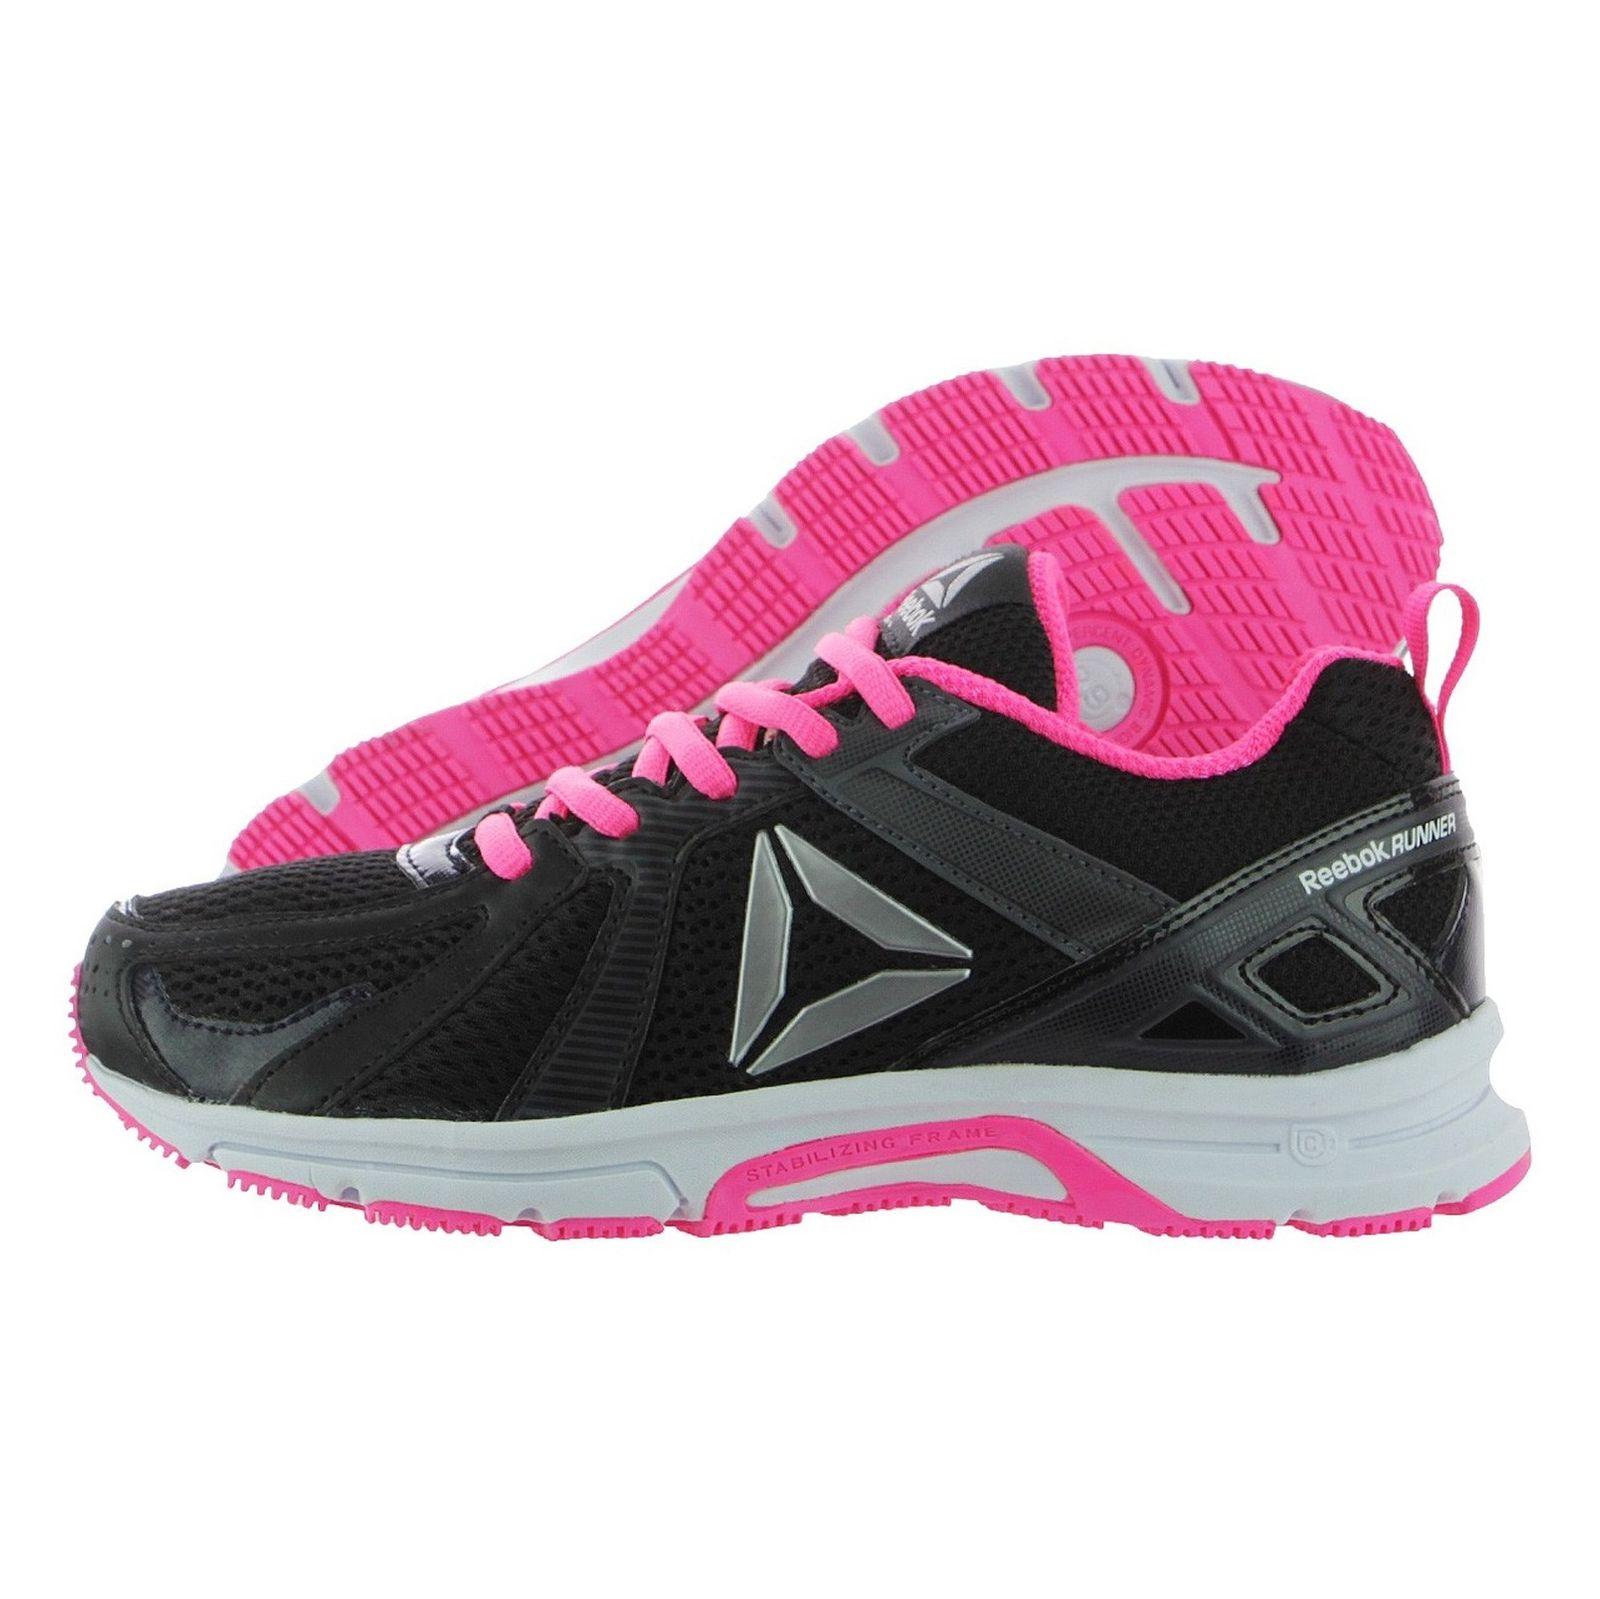 کفش دویدن زنانه Runner MT - ریباک - مشکي - 4